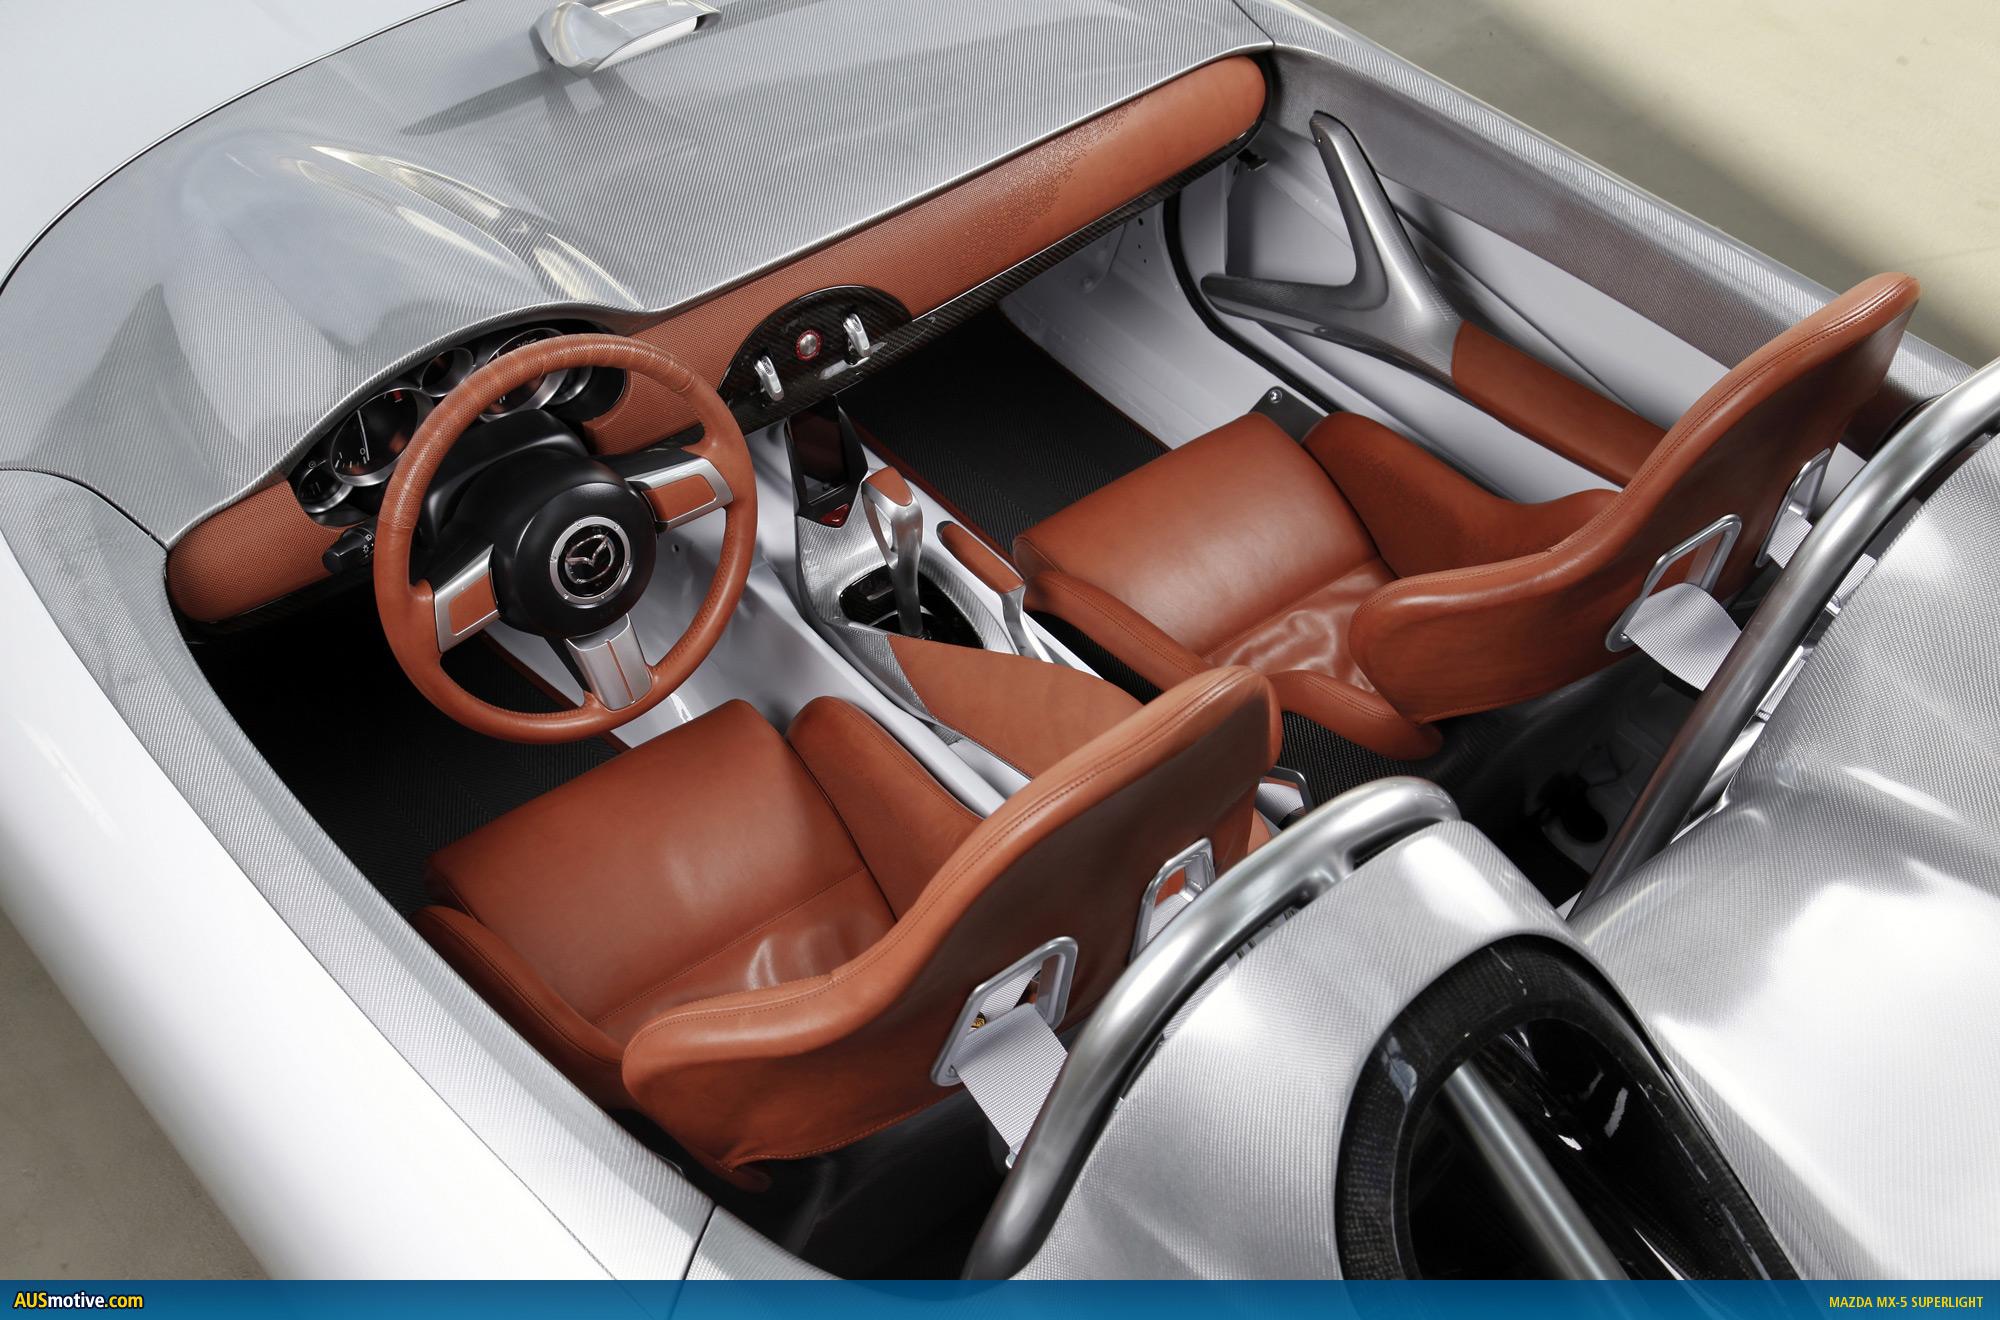 http://www.ausmotive.com/images/Mazda-MX-5-Superlight-IAA-18.jpg